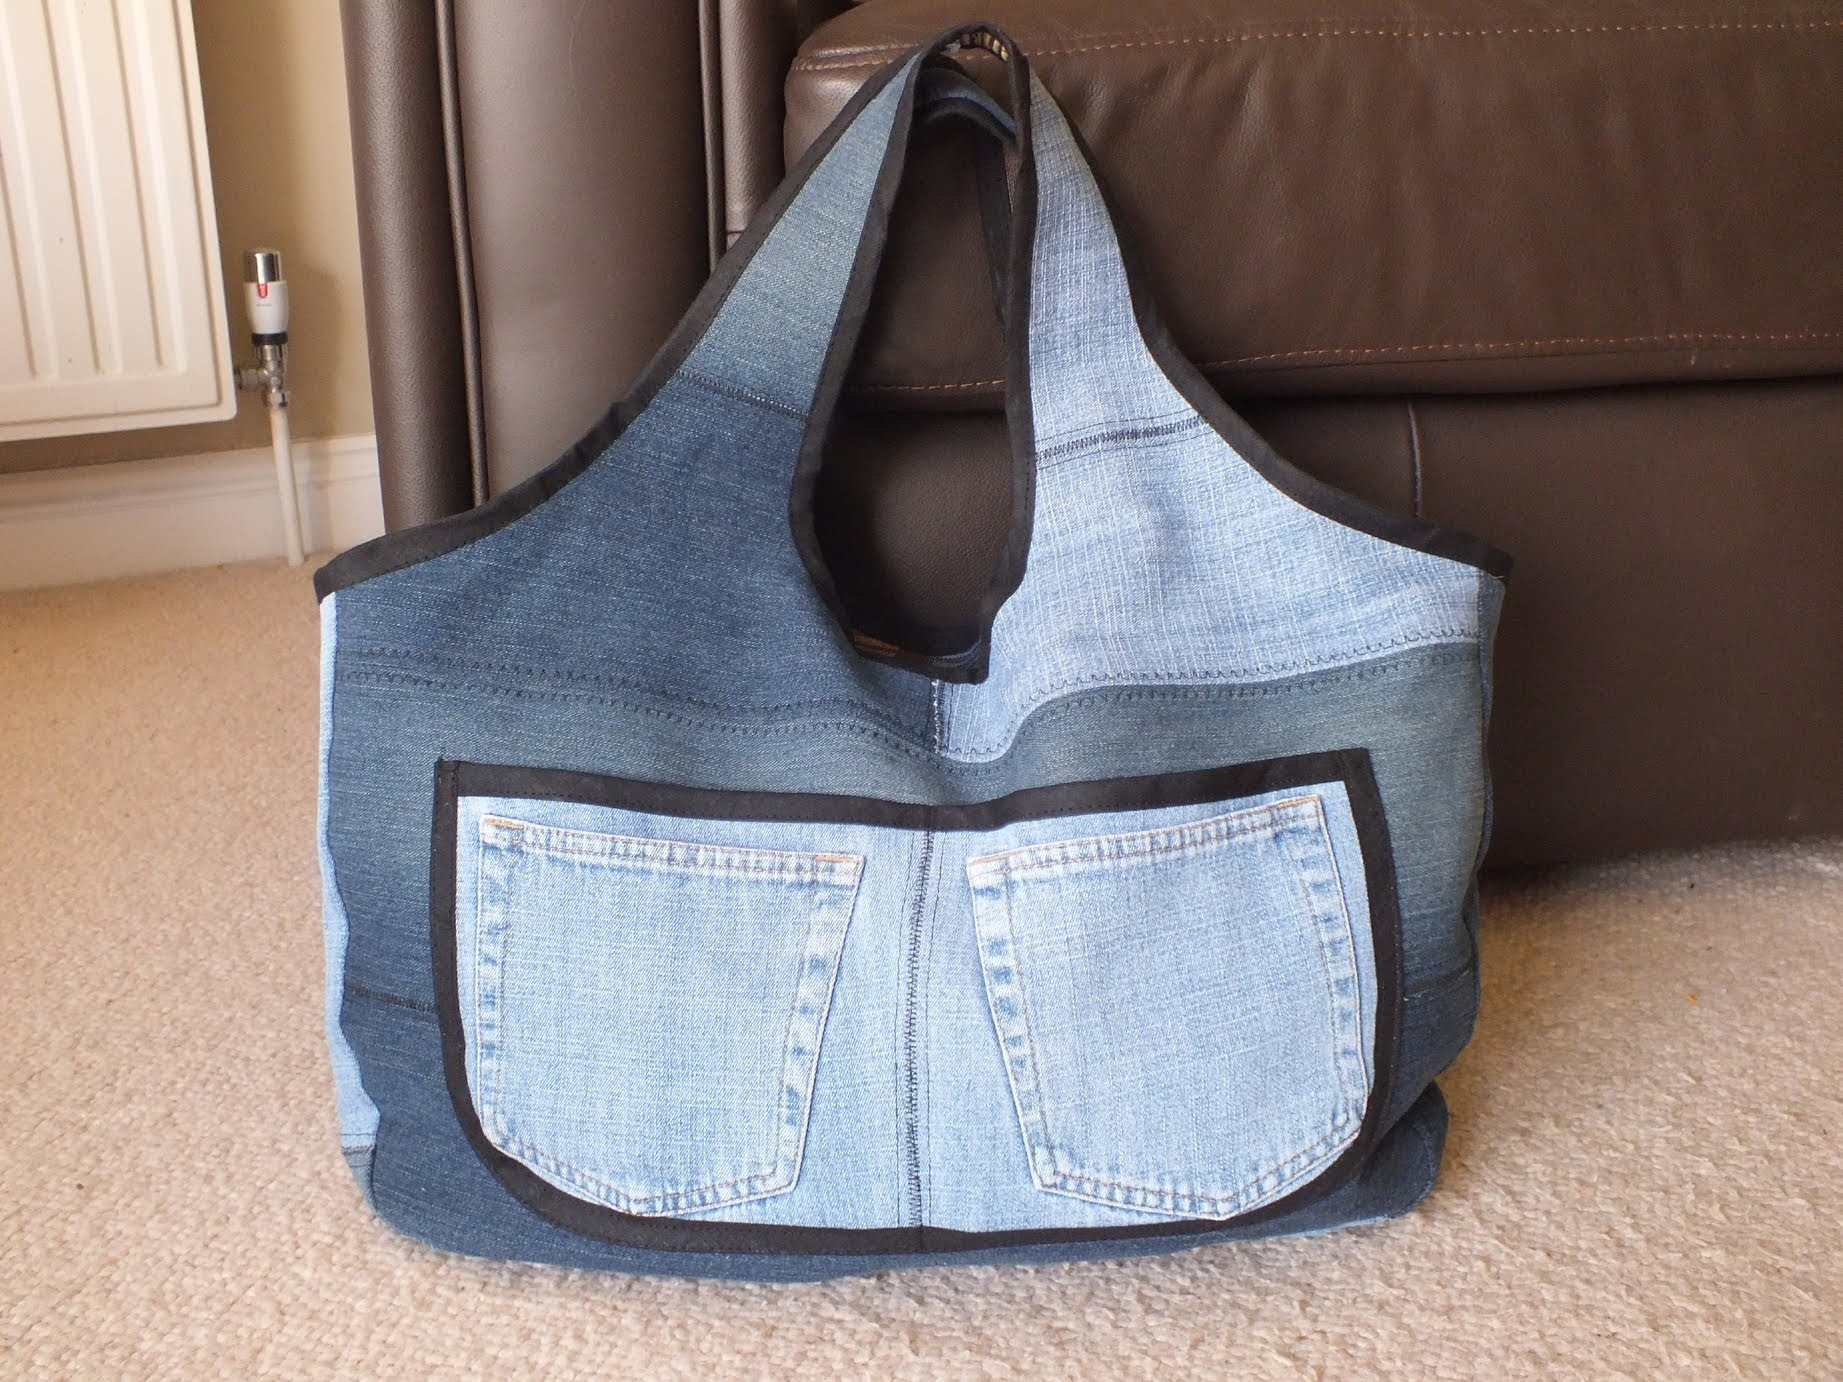 Recycled Jeans Bag (Sahara - 3) DIY jeans bag. denim sewing project